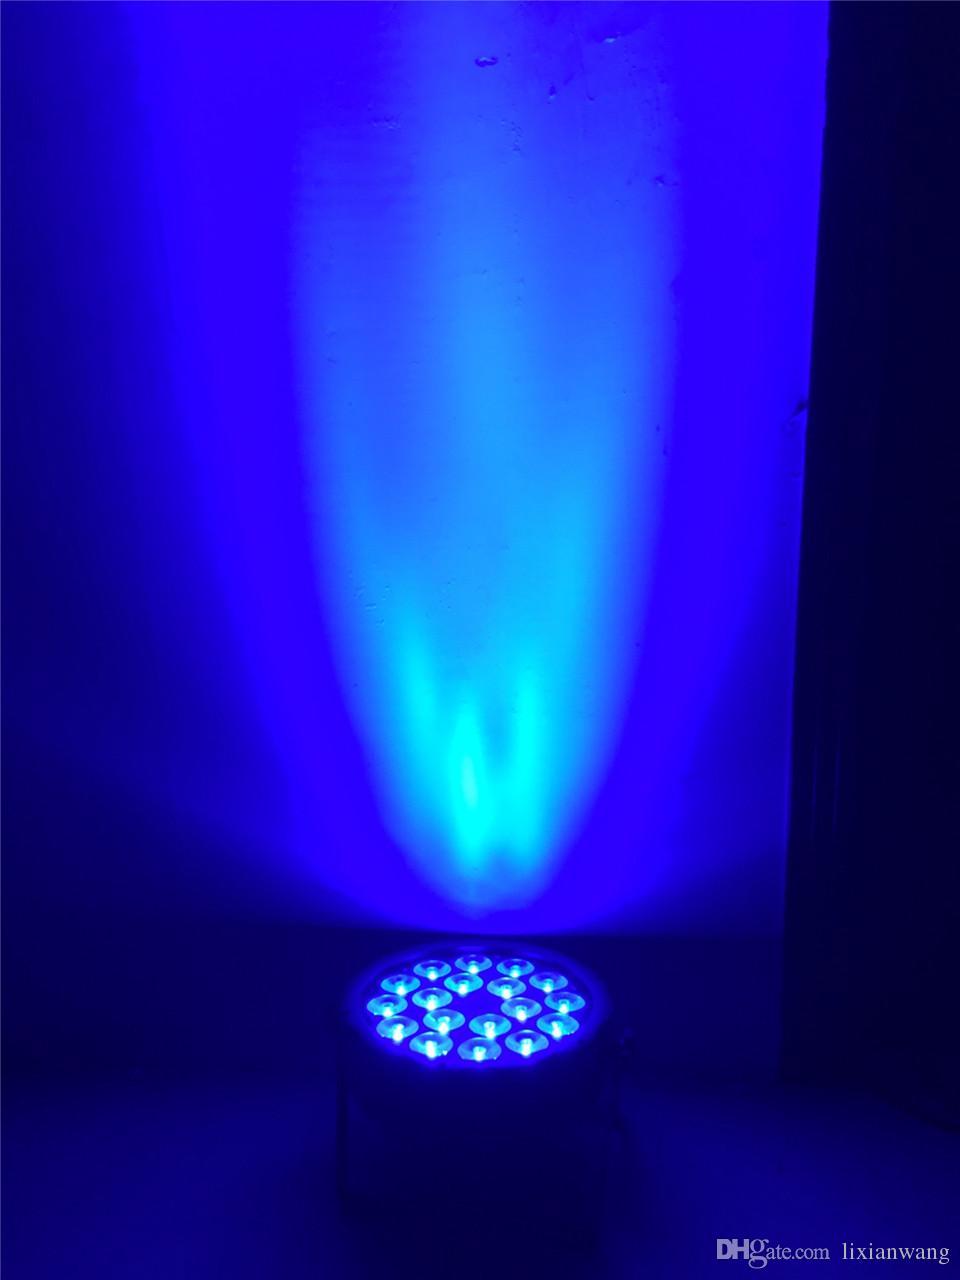 LED الاسمية 18X12 W RGBW 4IN1 لوس ديلا lavata دي فندق Lusso تحكم DMX بقيادة شقة الاسمية وسي دي جي